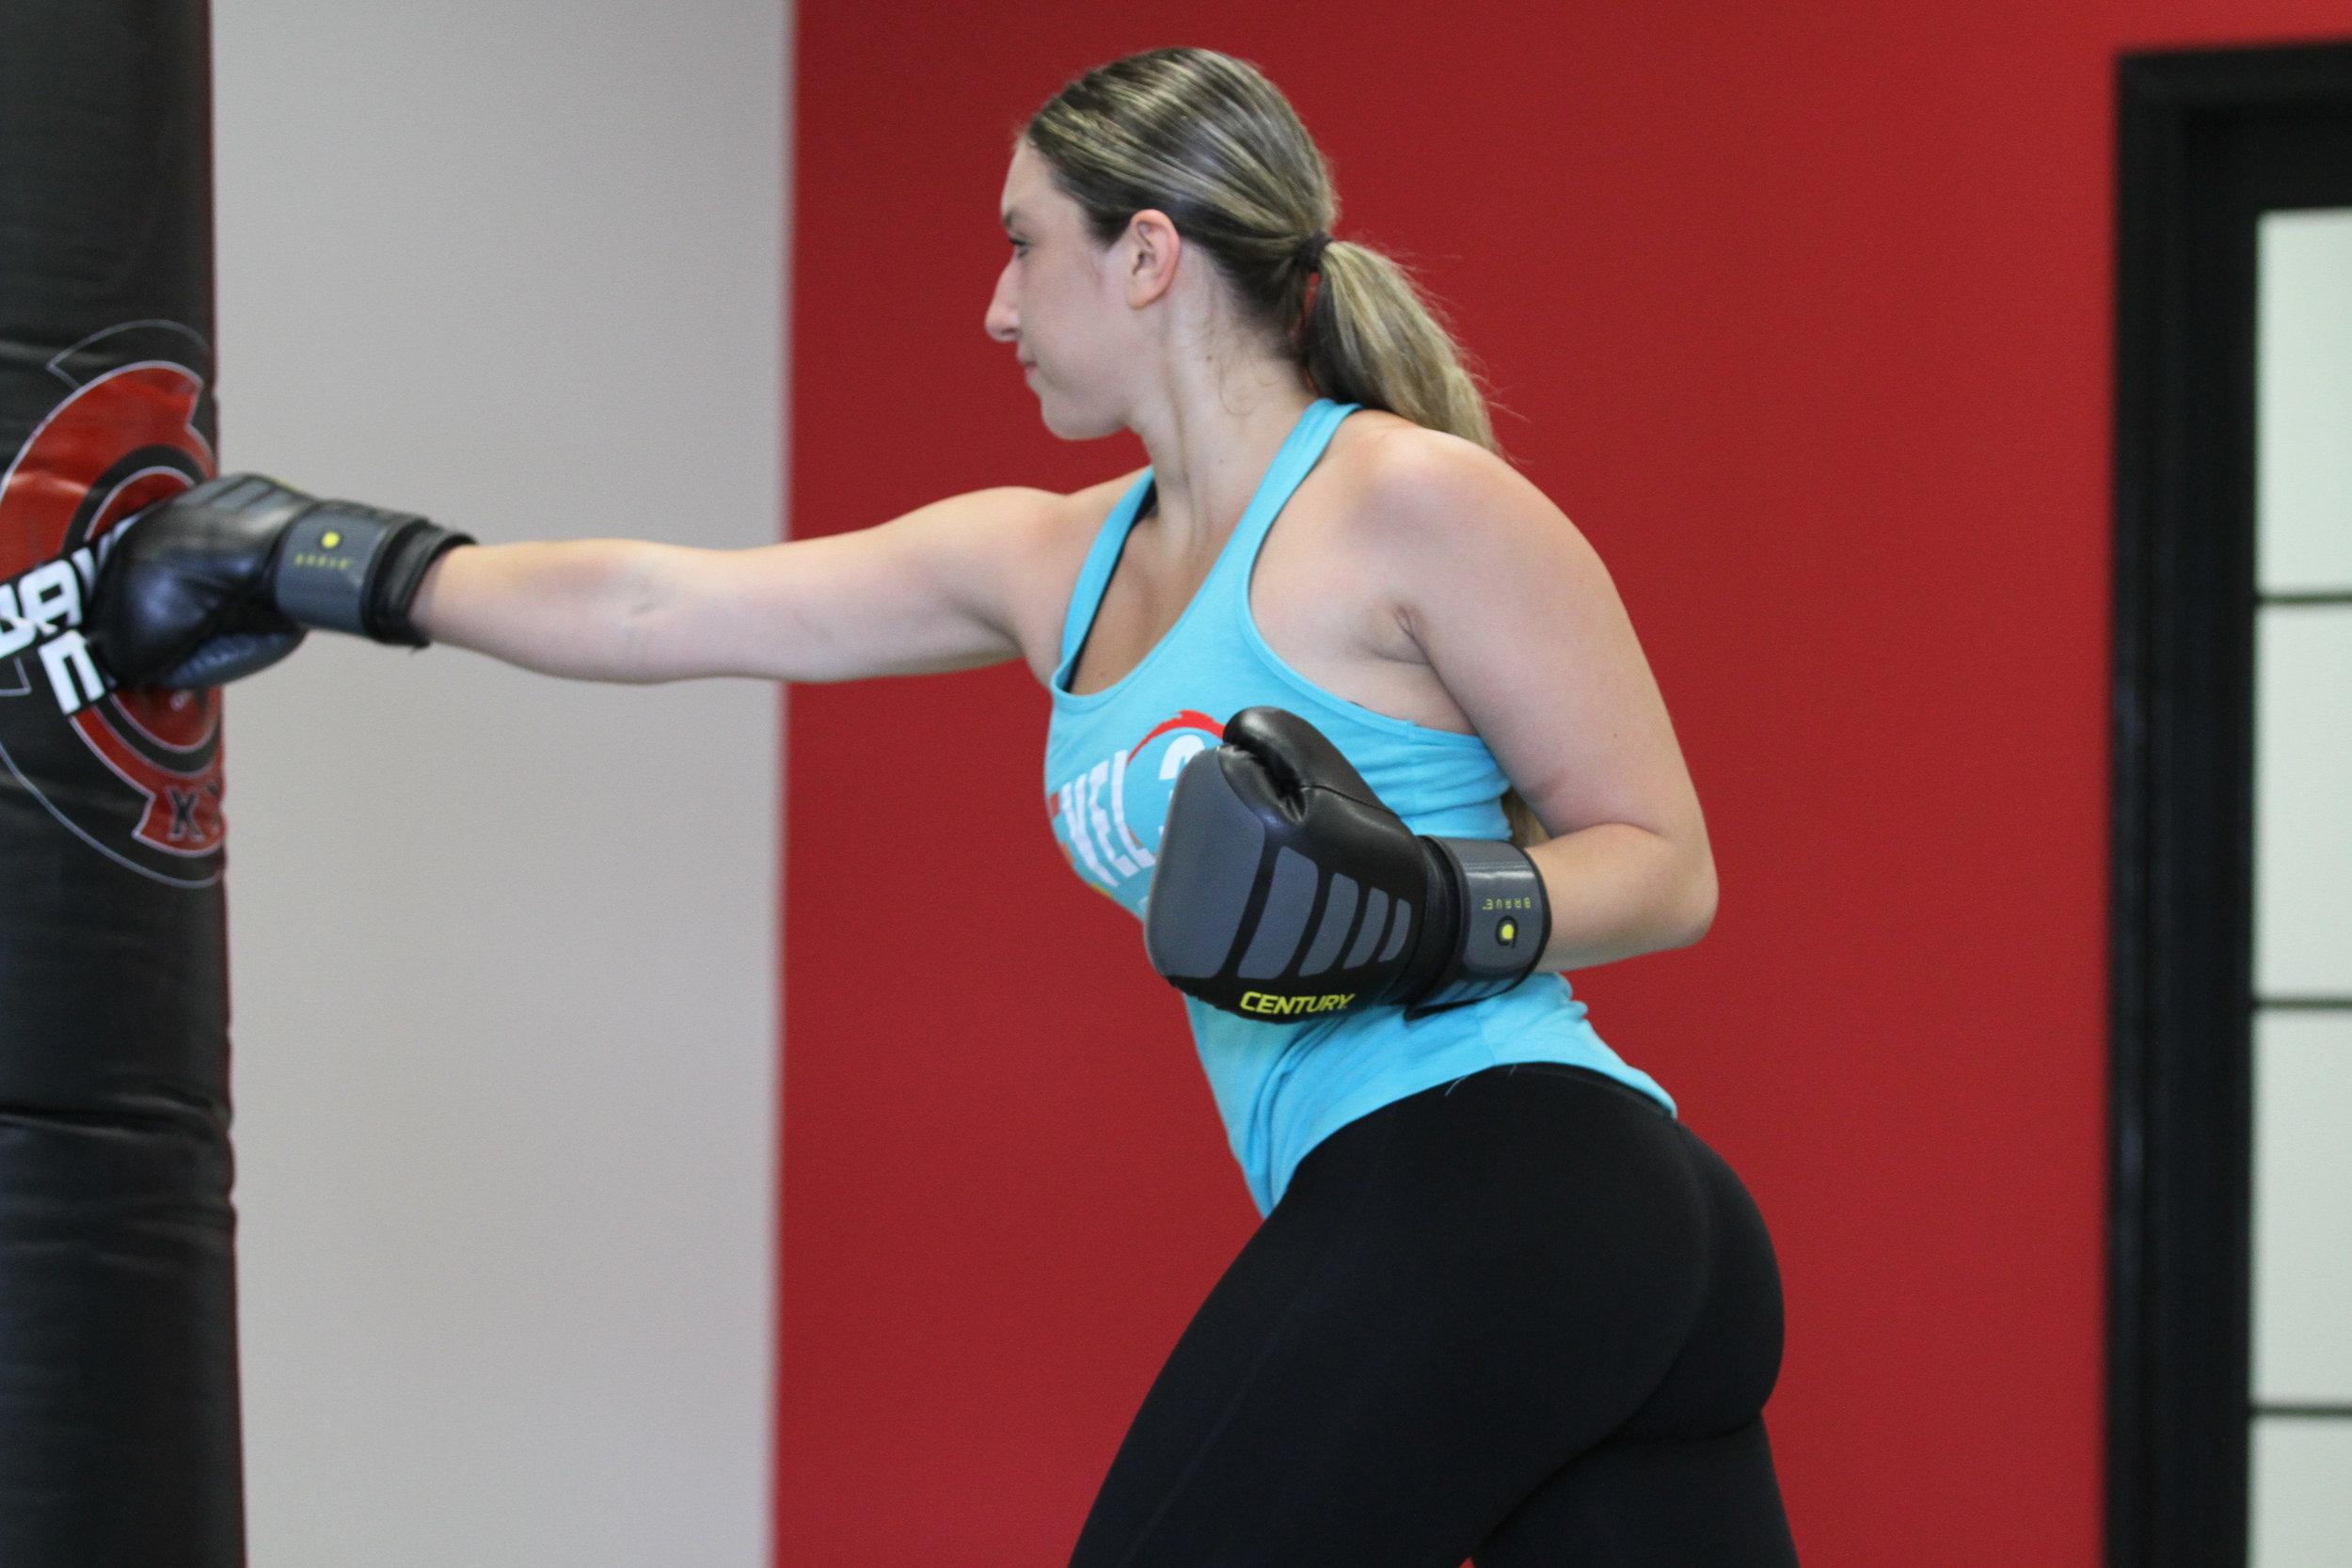 womens martial arts classes near me